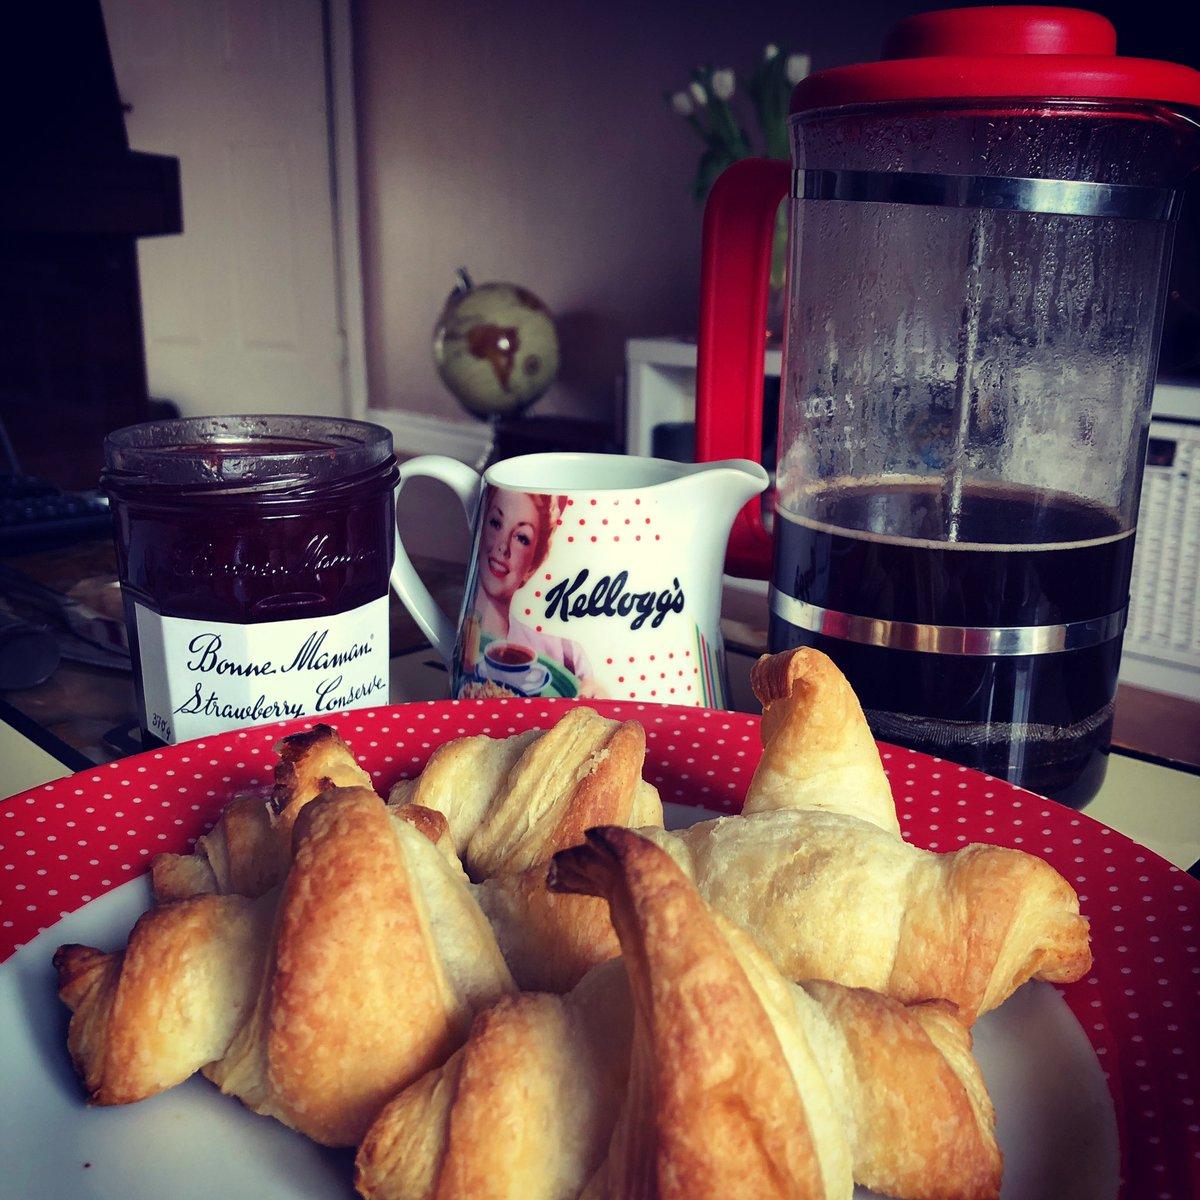 When @Cjprice88 makes fresh #croissants & #coffee. Fiancé goals. #breakfast #pastrychef pic.twitter.com/1aJHmxacAC